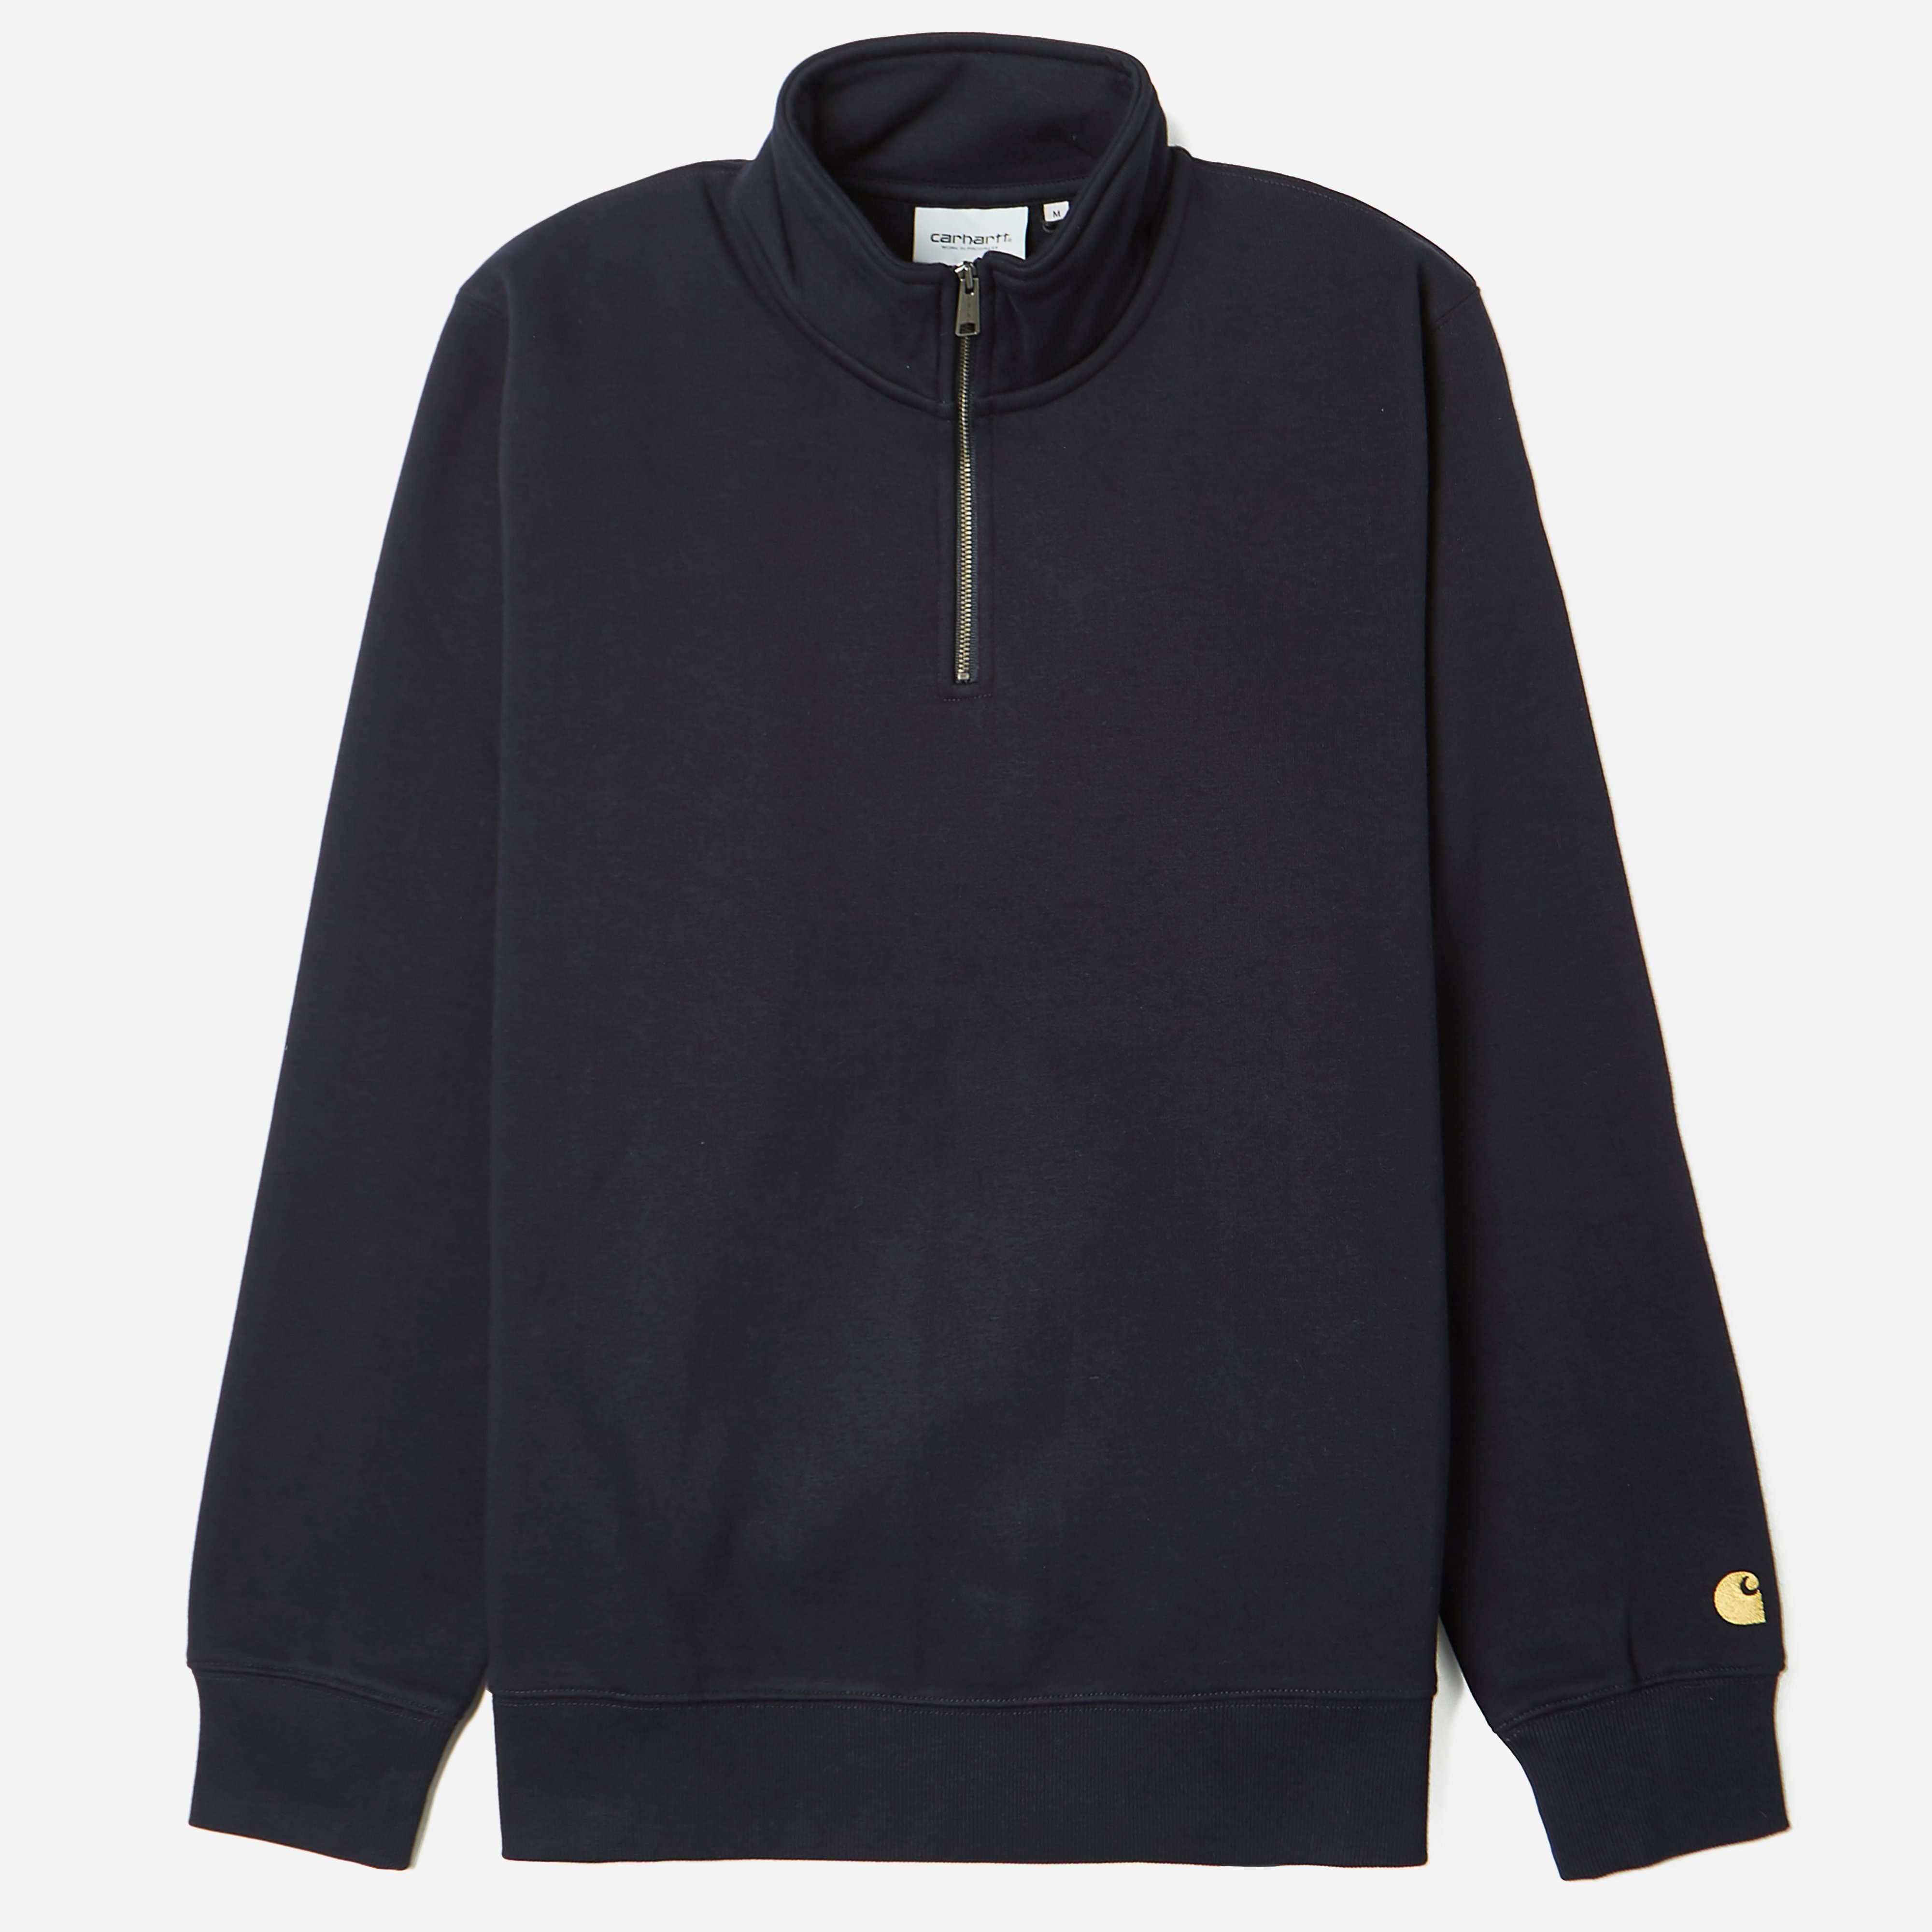 Carhartt WIP Chase Highneck Sweatshirt